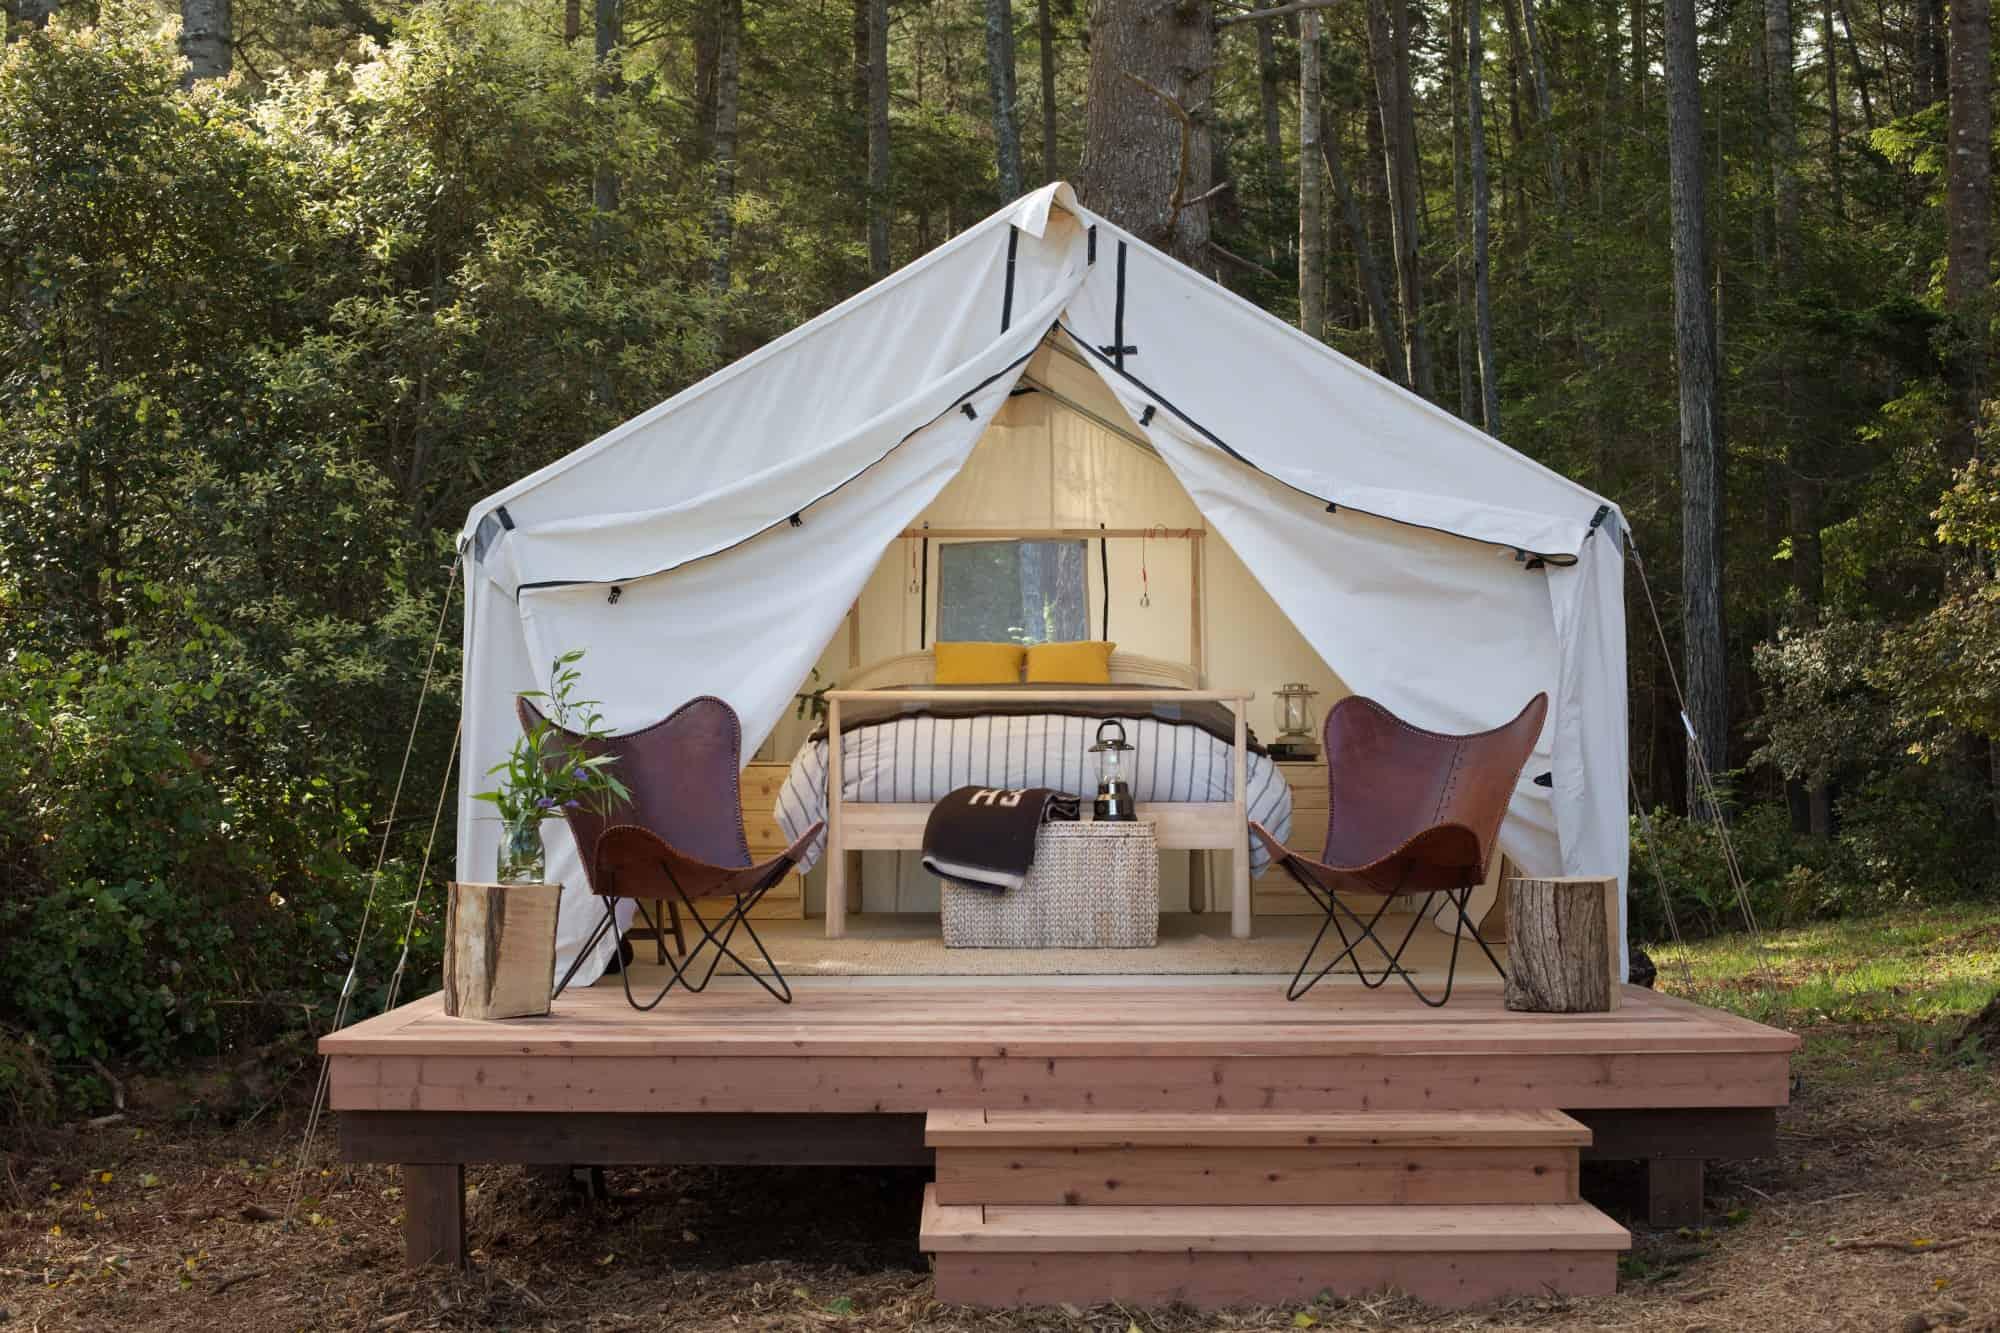 Camping Made Comfy at Mendocino Grove